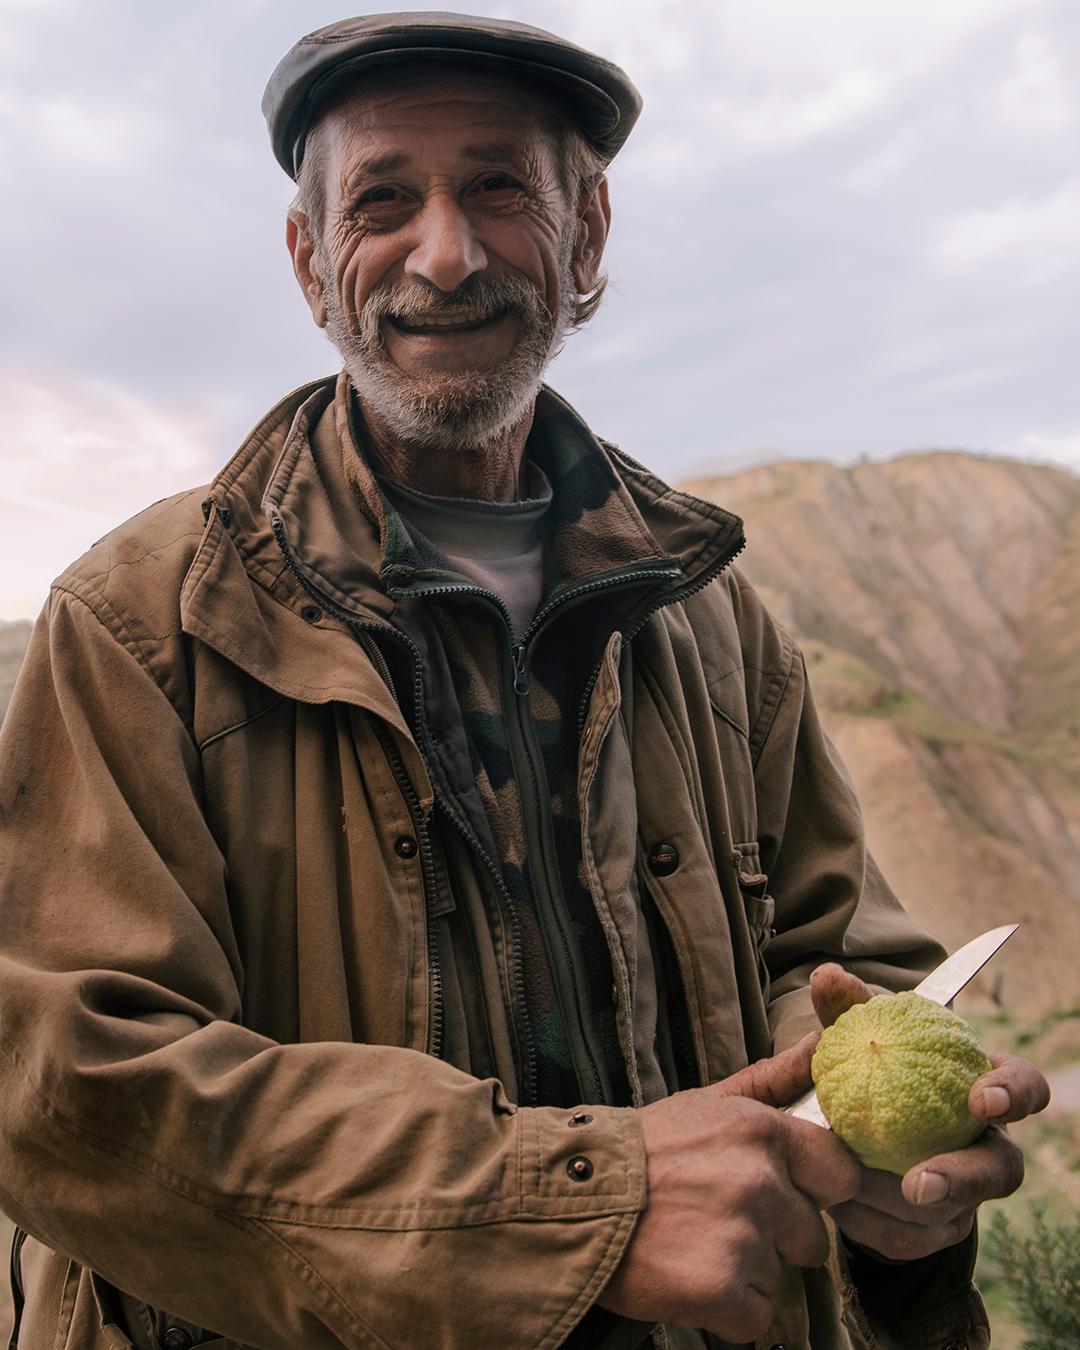 Special Thanks to our favourite Bergamot Farmer.